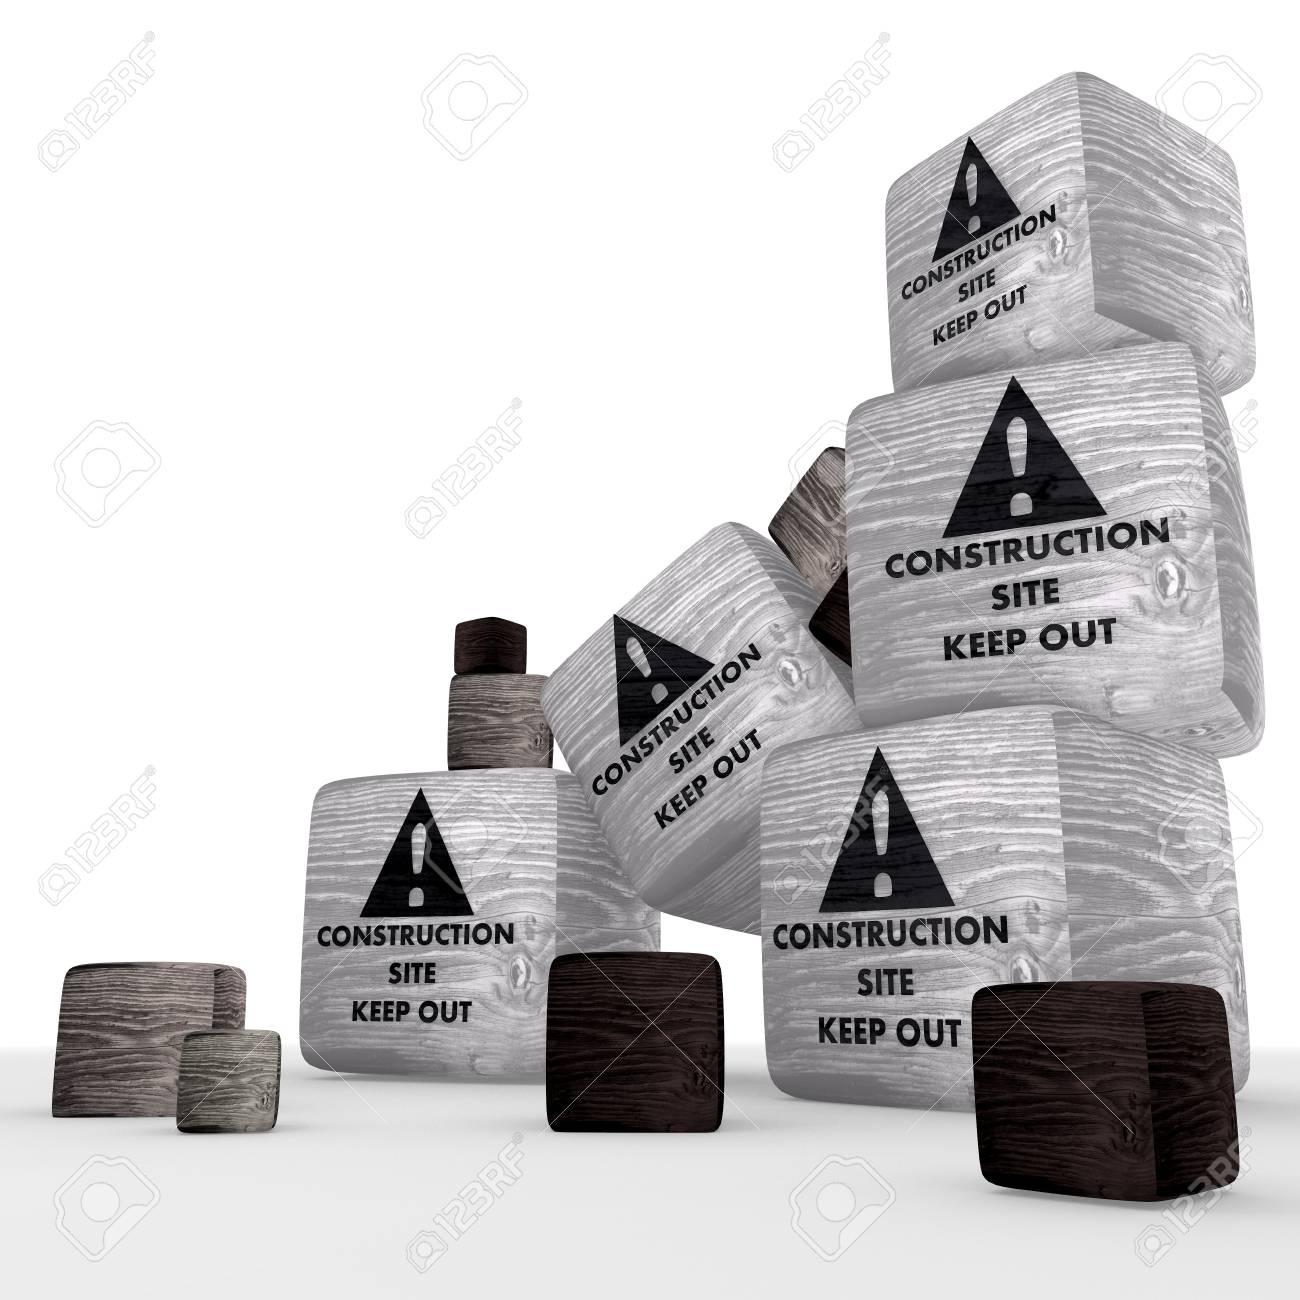 construction site wooden symbol cubes Stock Photo - 17578909